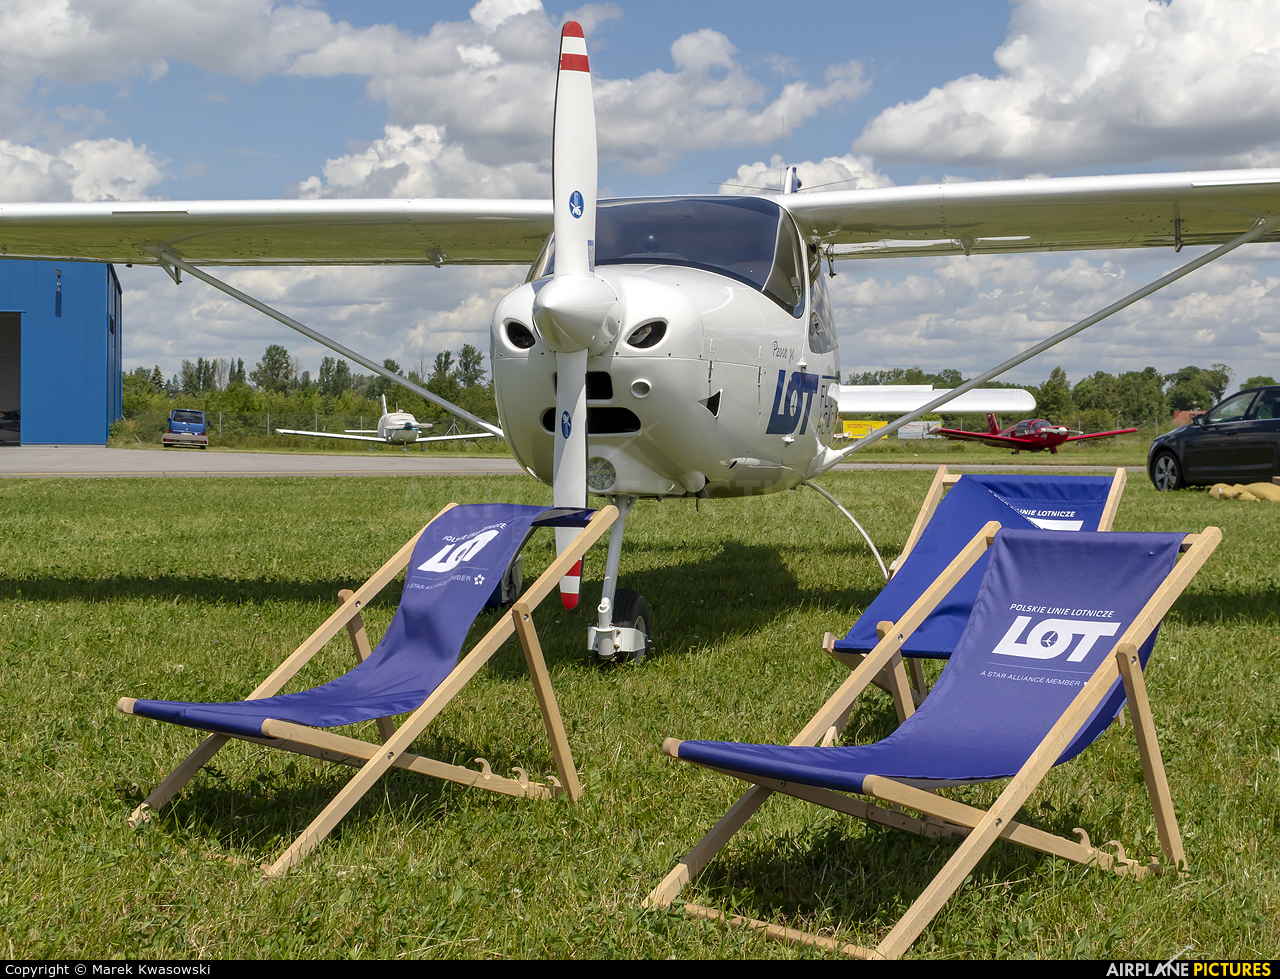 LOT Flight Academy SP-LFC aircraft at Piotrków Trybunalski